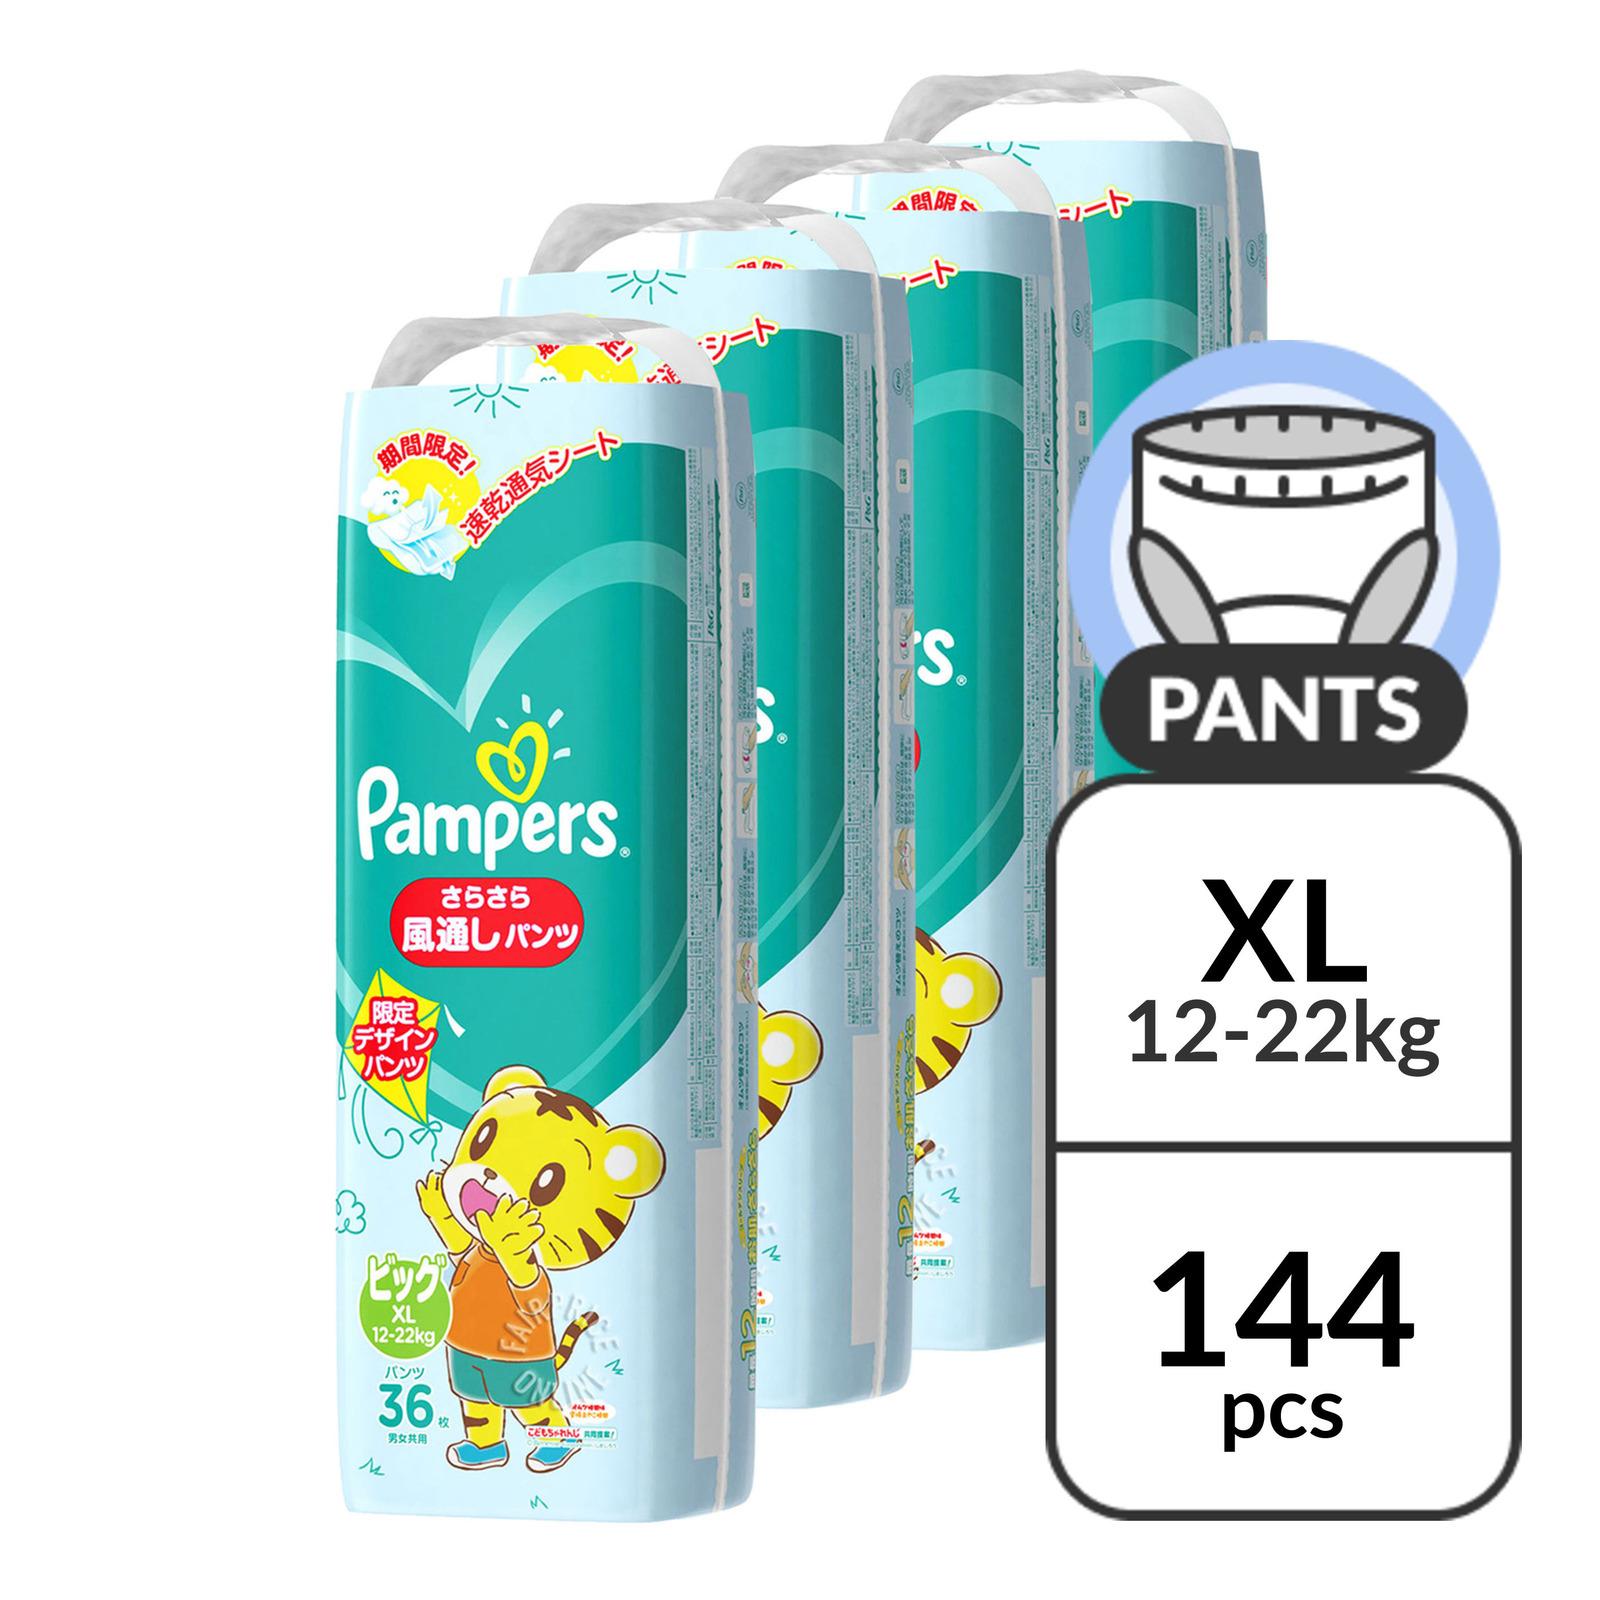 Pampers Summer Baby Diaper Pants - XL (12-22kg)